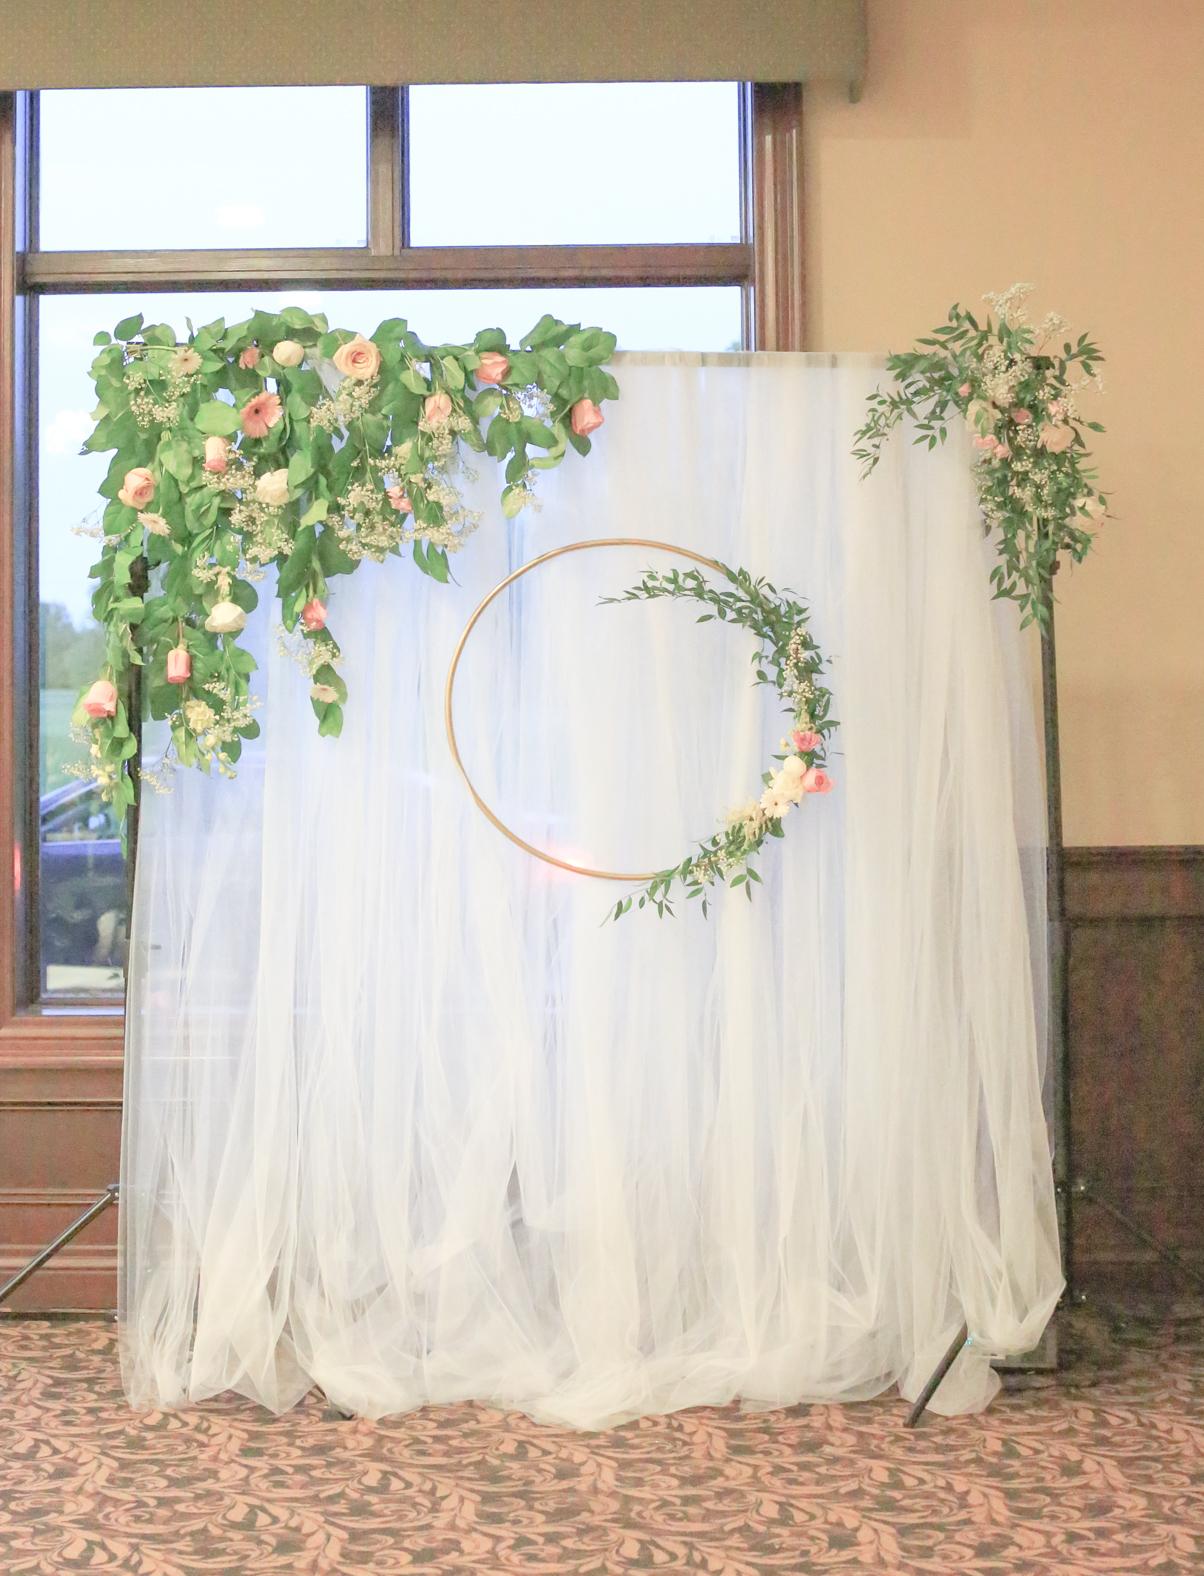 Chic Rustic Romantic Wedding